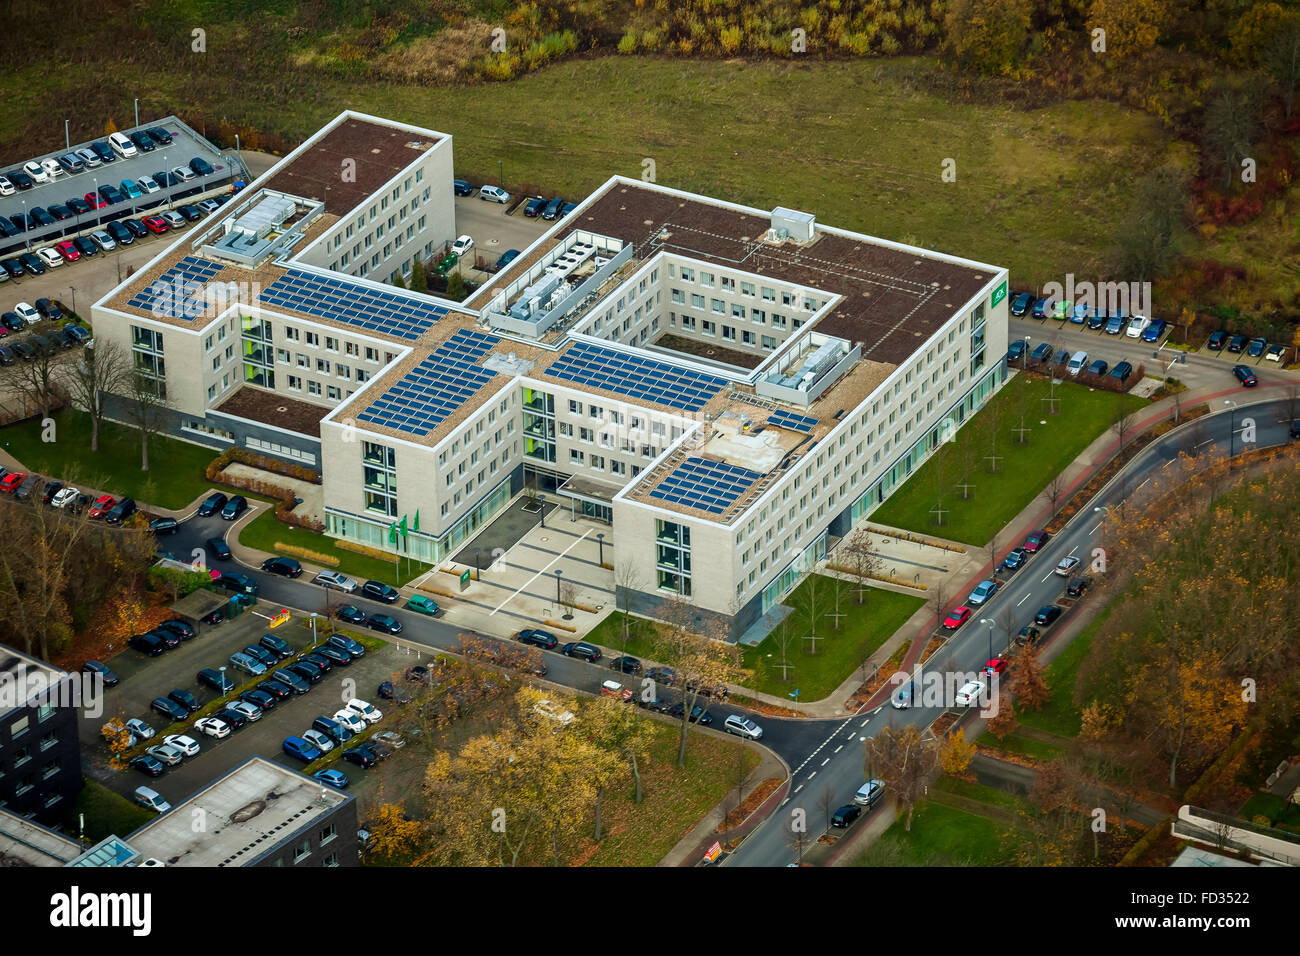 Aerial view, AOK administration Stadtkrone Ost, Allgemeine Ortskrankenkasse, health insurance, health system, Dortmund, - Stock Image